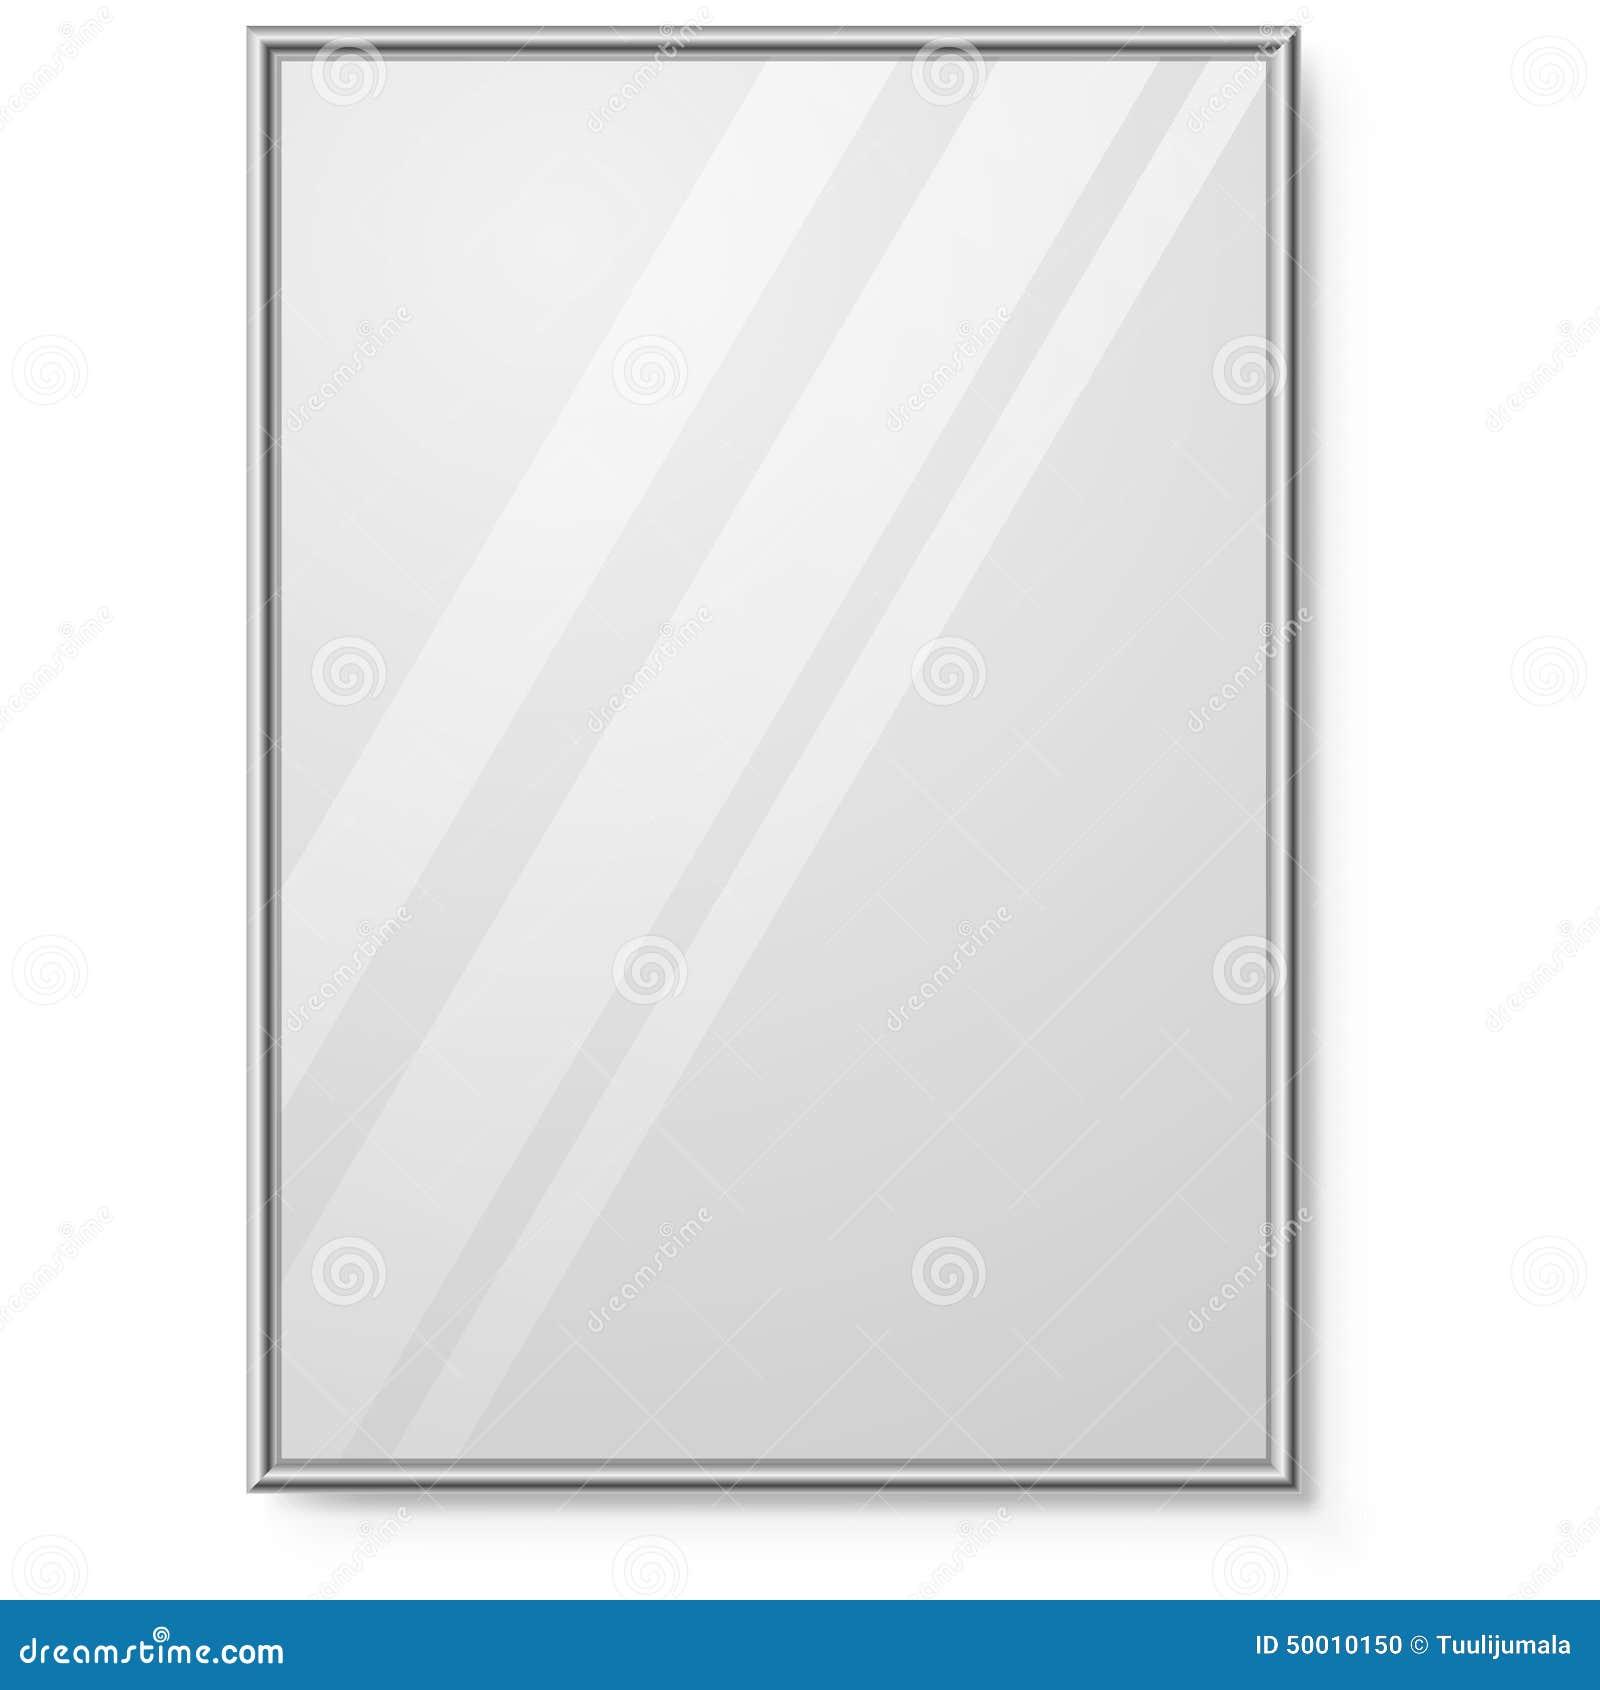 Fein Spiegel Magie Rahmen Fotos - Benutzerdefinierte Bilderrahmen ...